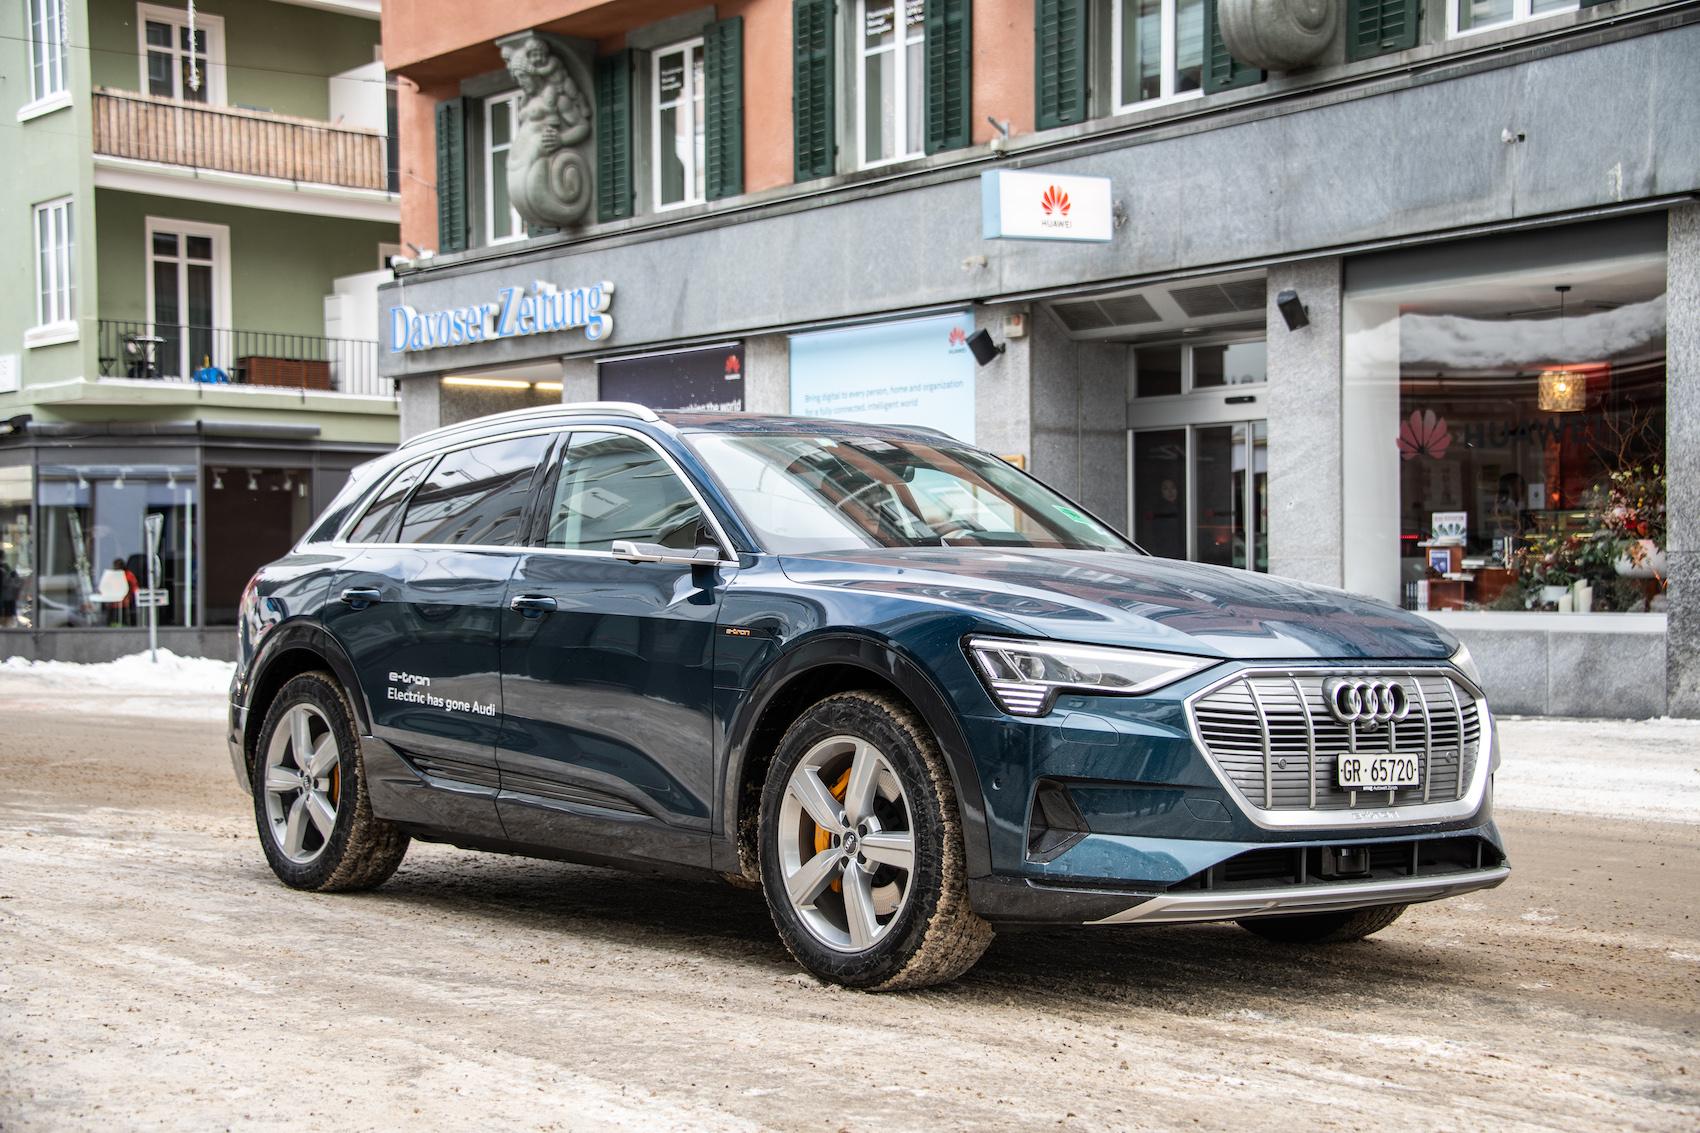 Il est insensible au froid des Alpes: un SUV Audi e-tron sillonnant Davos. (Photo: Adrian Bretscher)